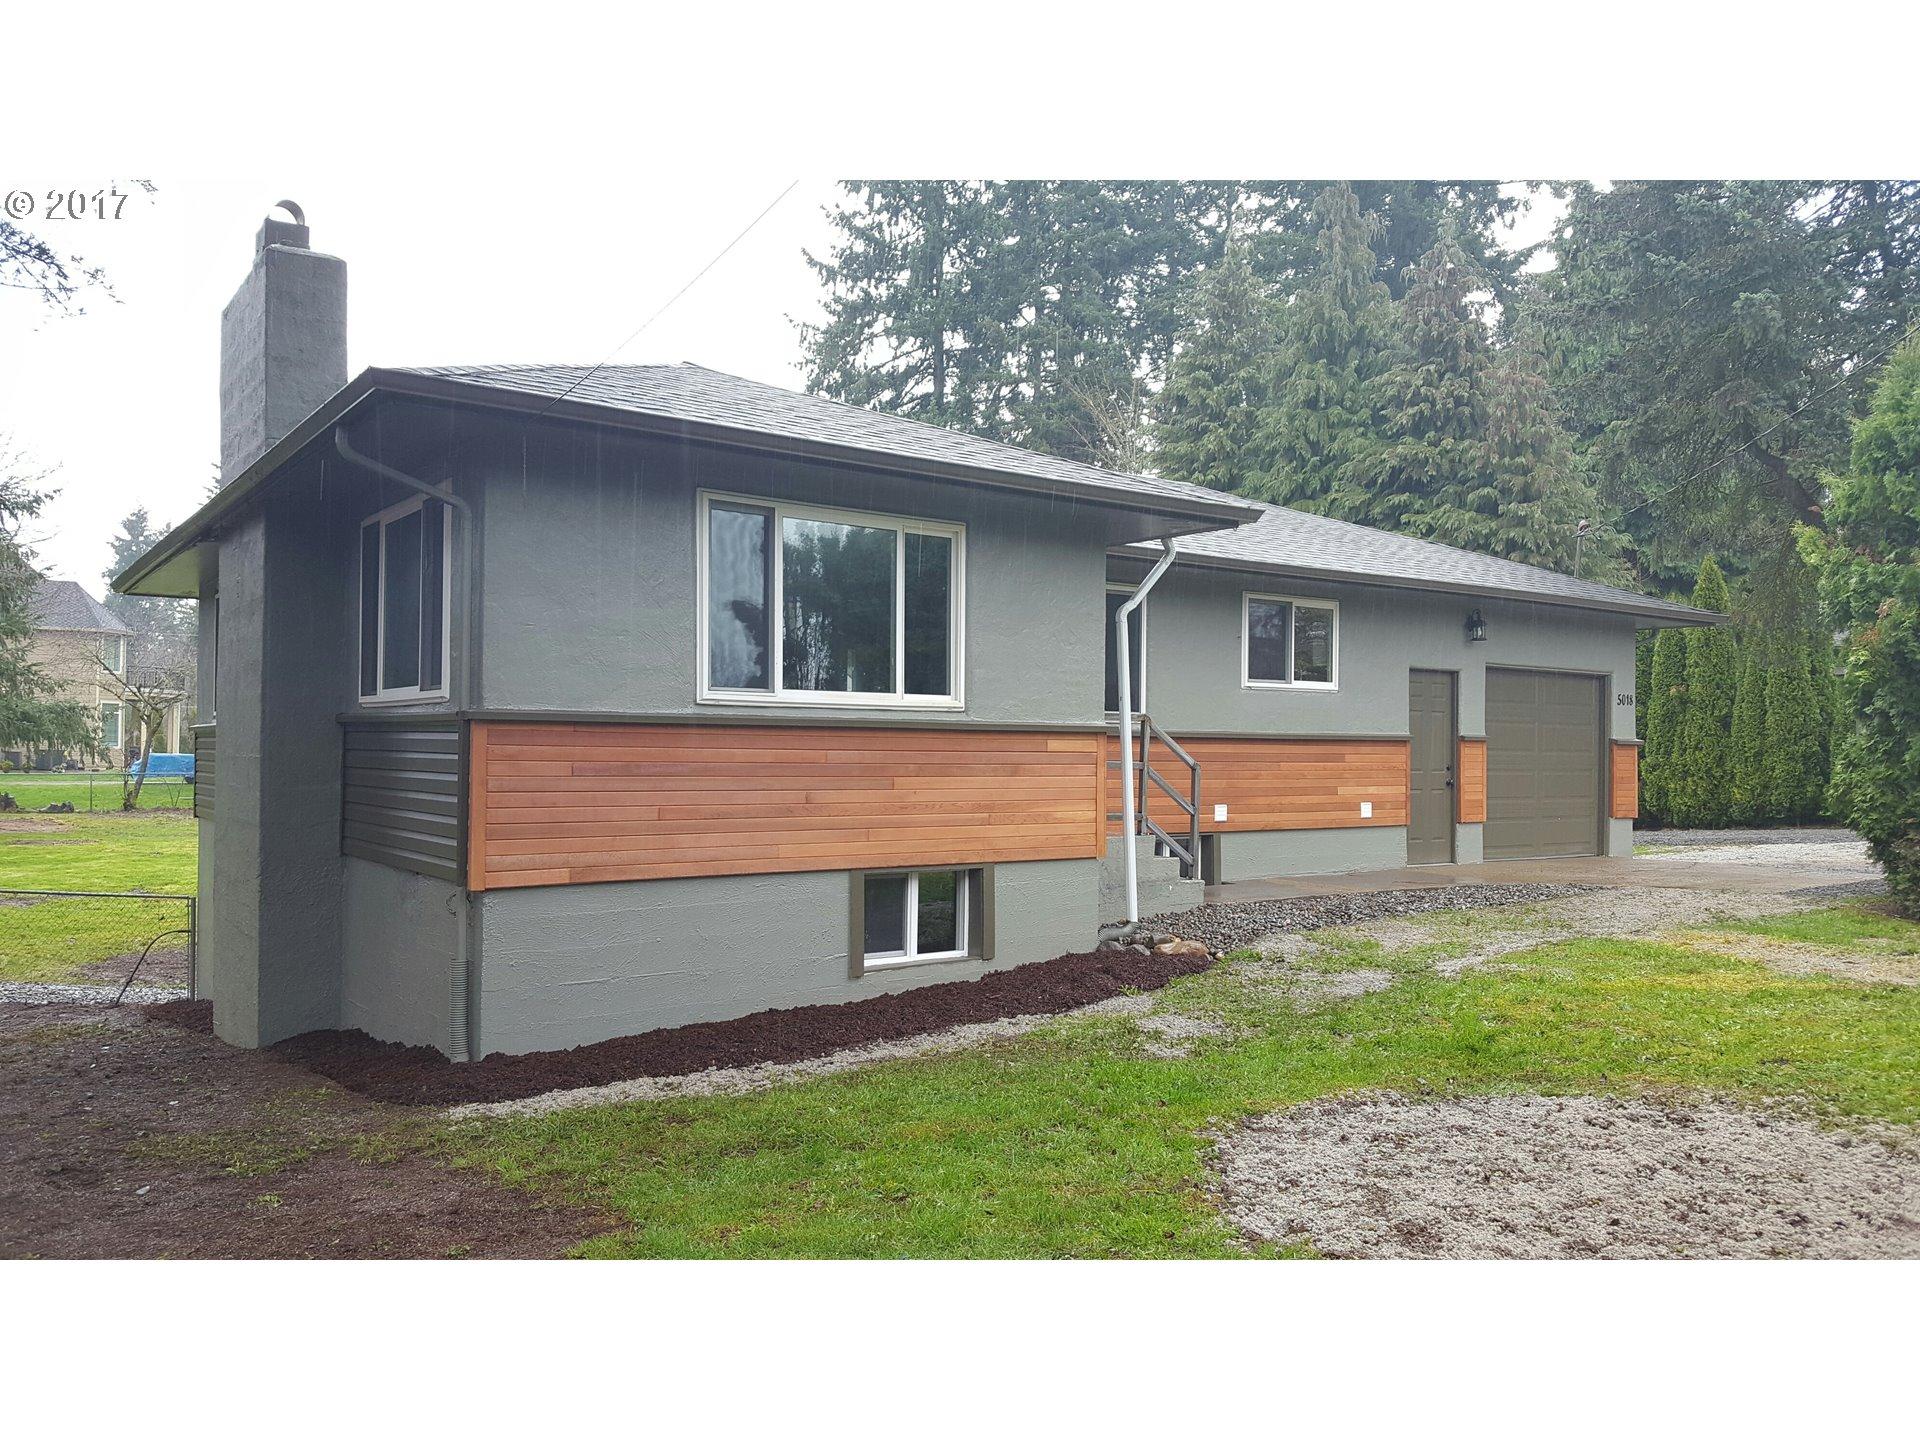 5018 NE 125TH ST, Vancouver, WA 98686